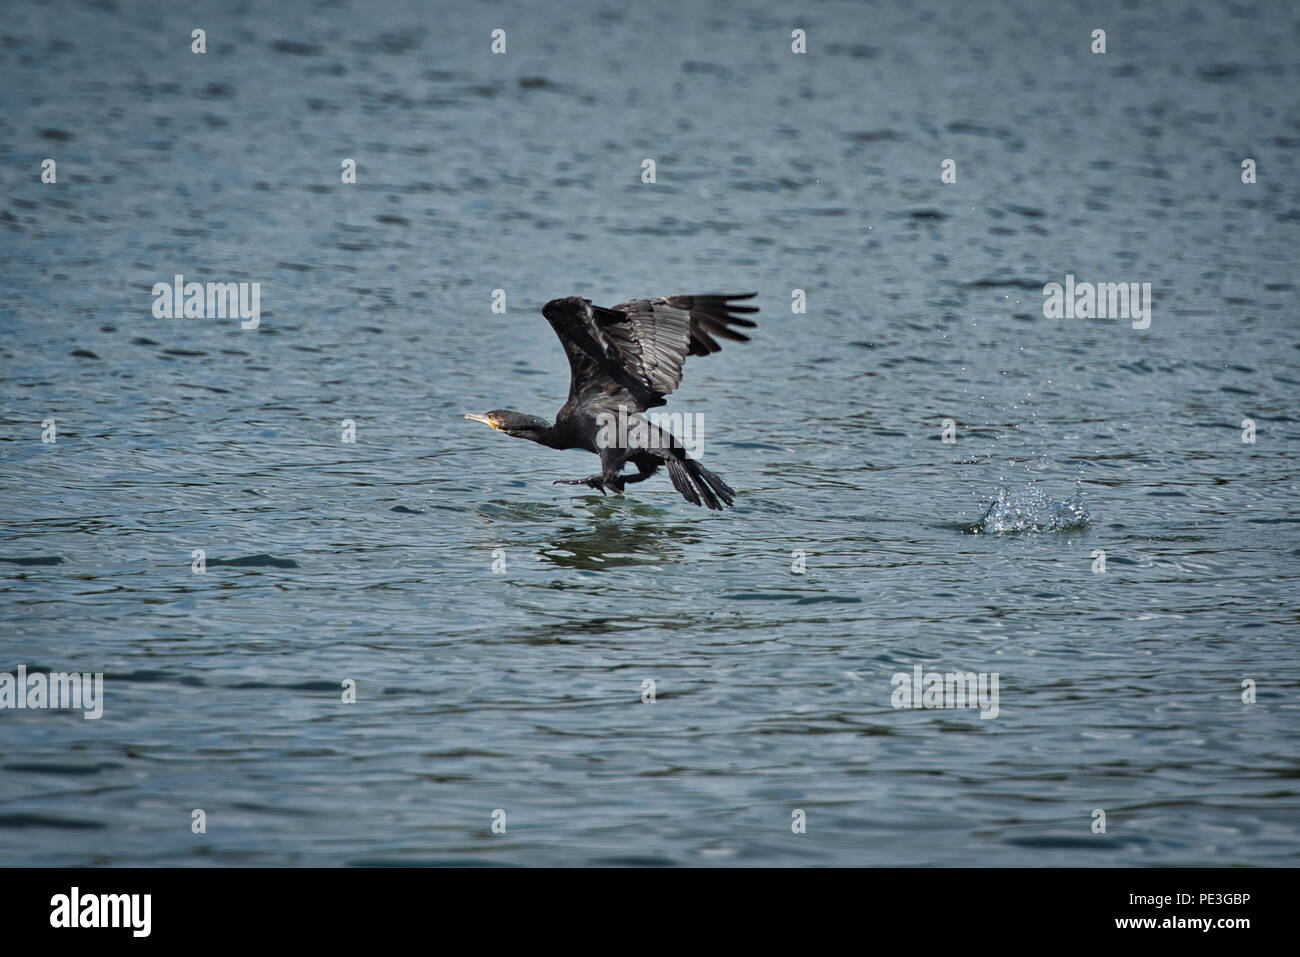 Wildlife Photography on Rhein River - Stock Image